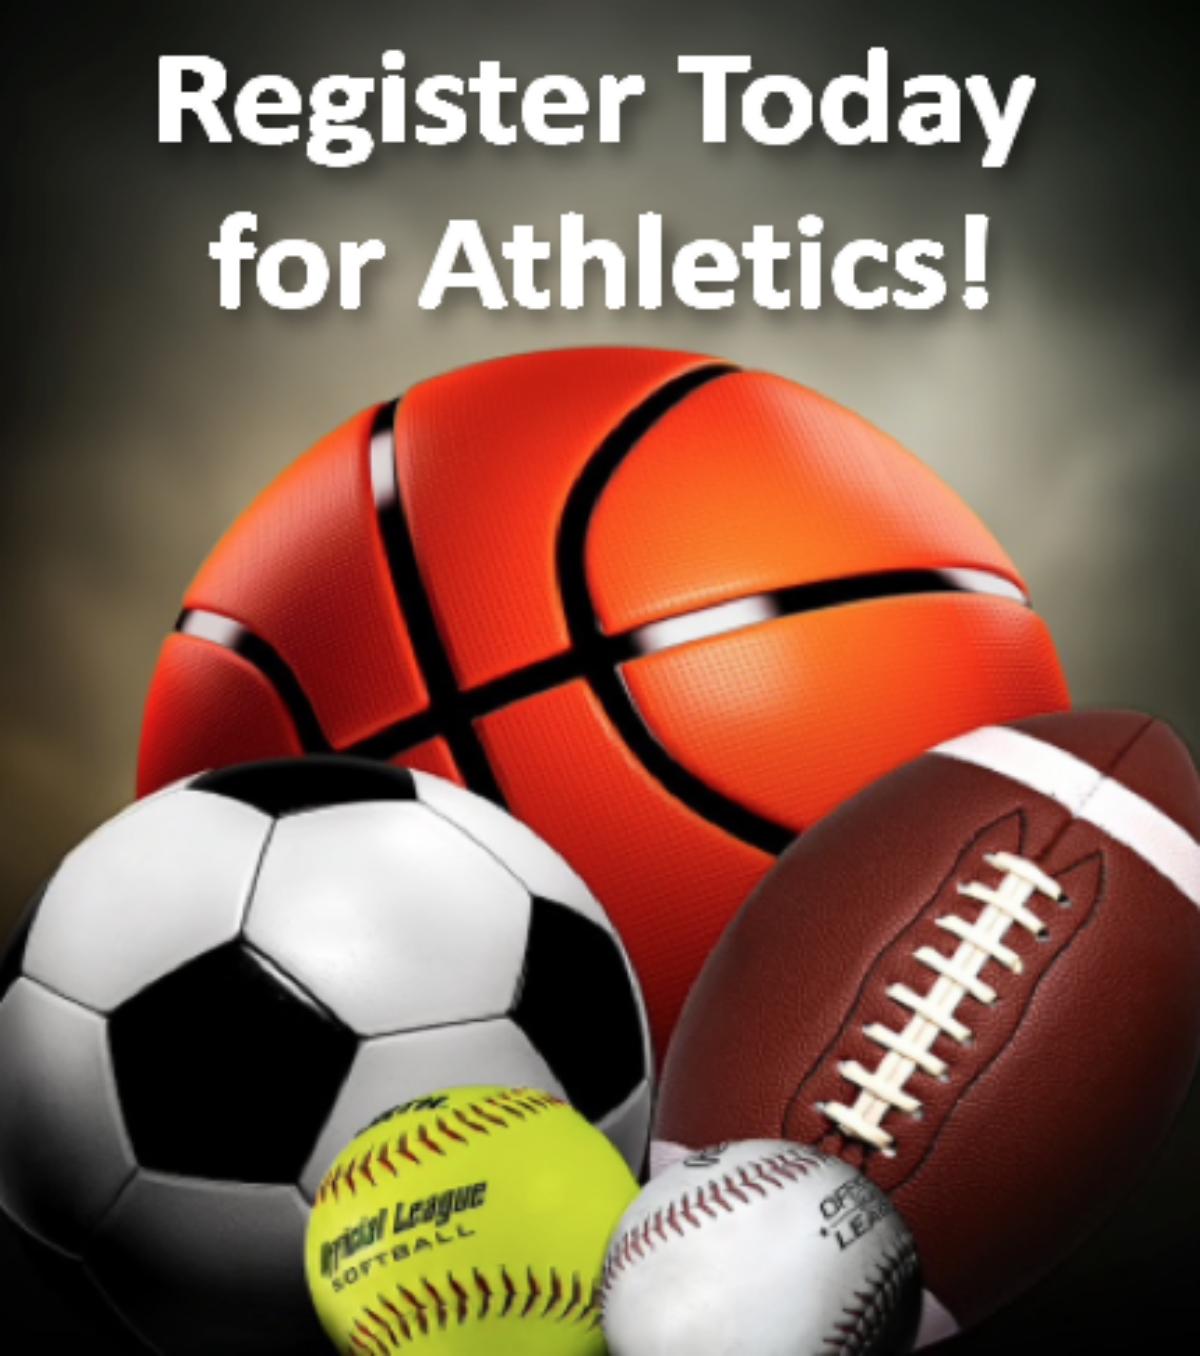 Register Today for Athletics! A basketball, soccer ball, football, tennis ball and a baseball